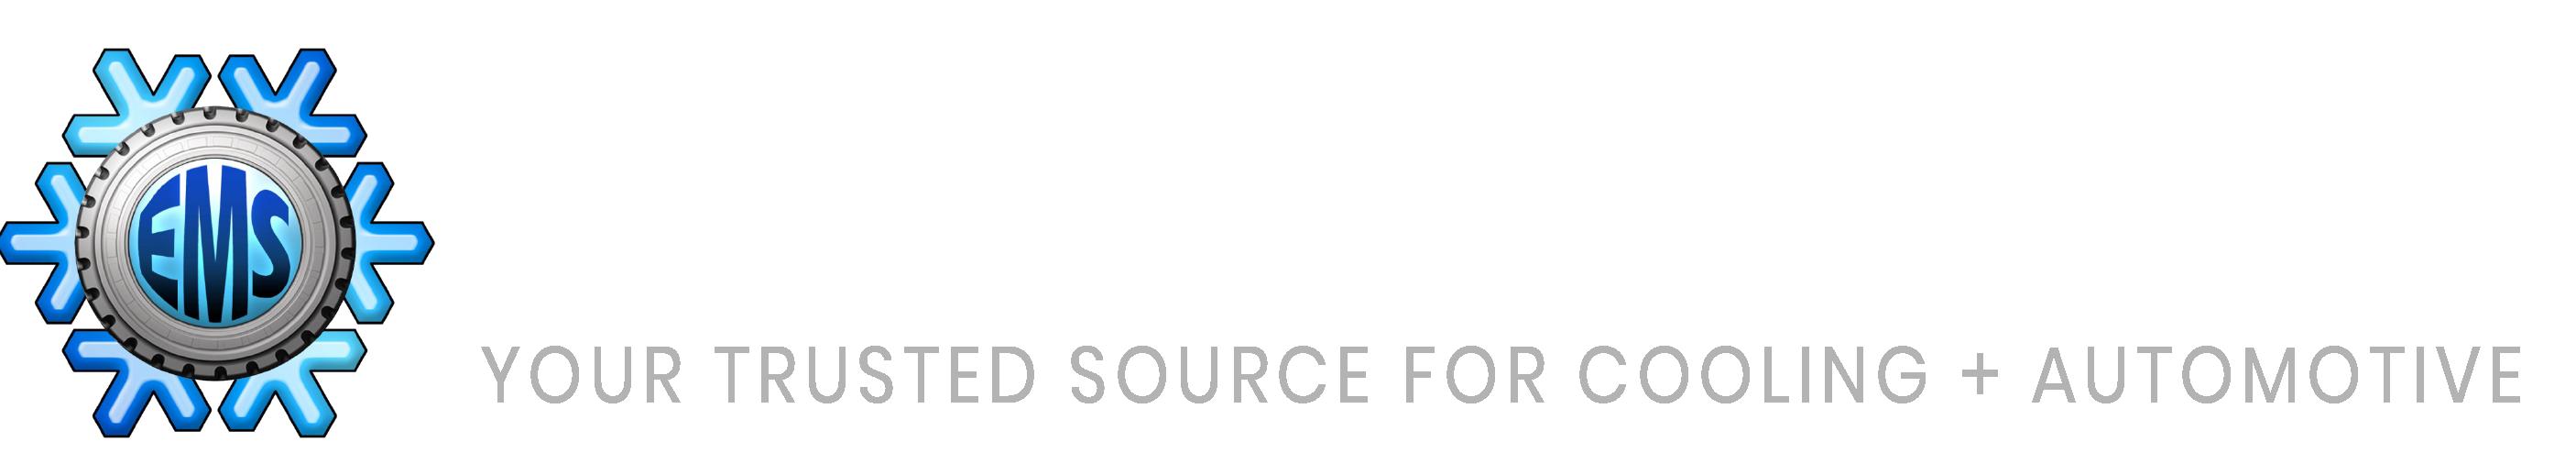 enrique martinez & sons horizontal logo